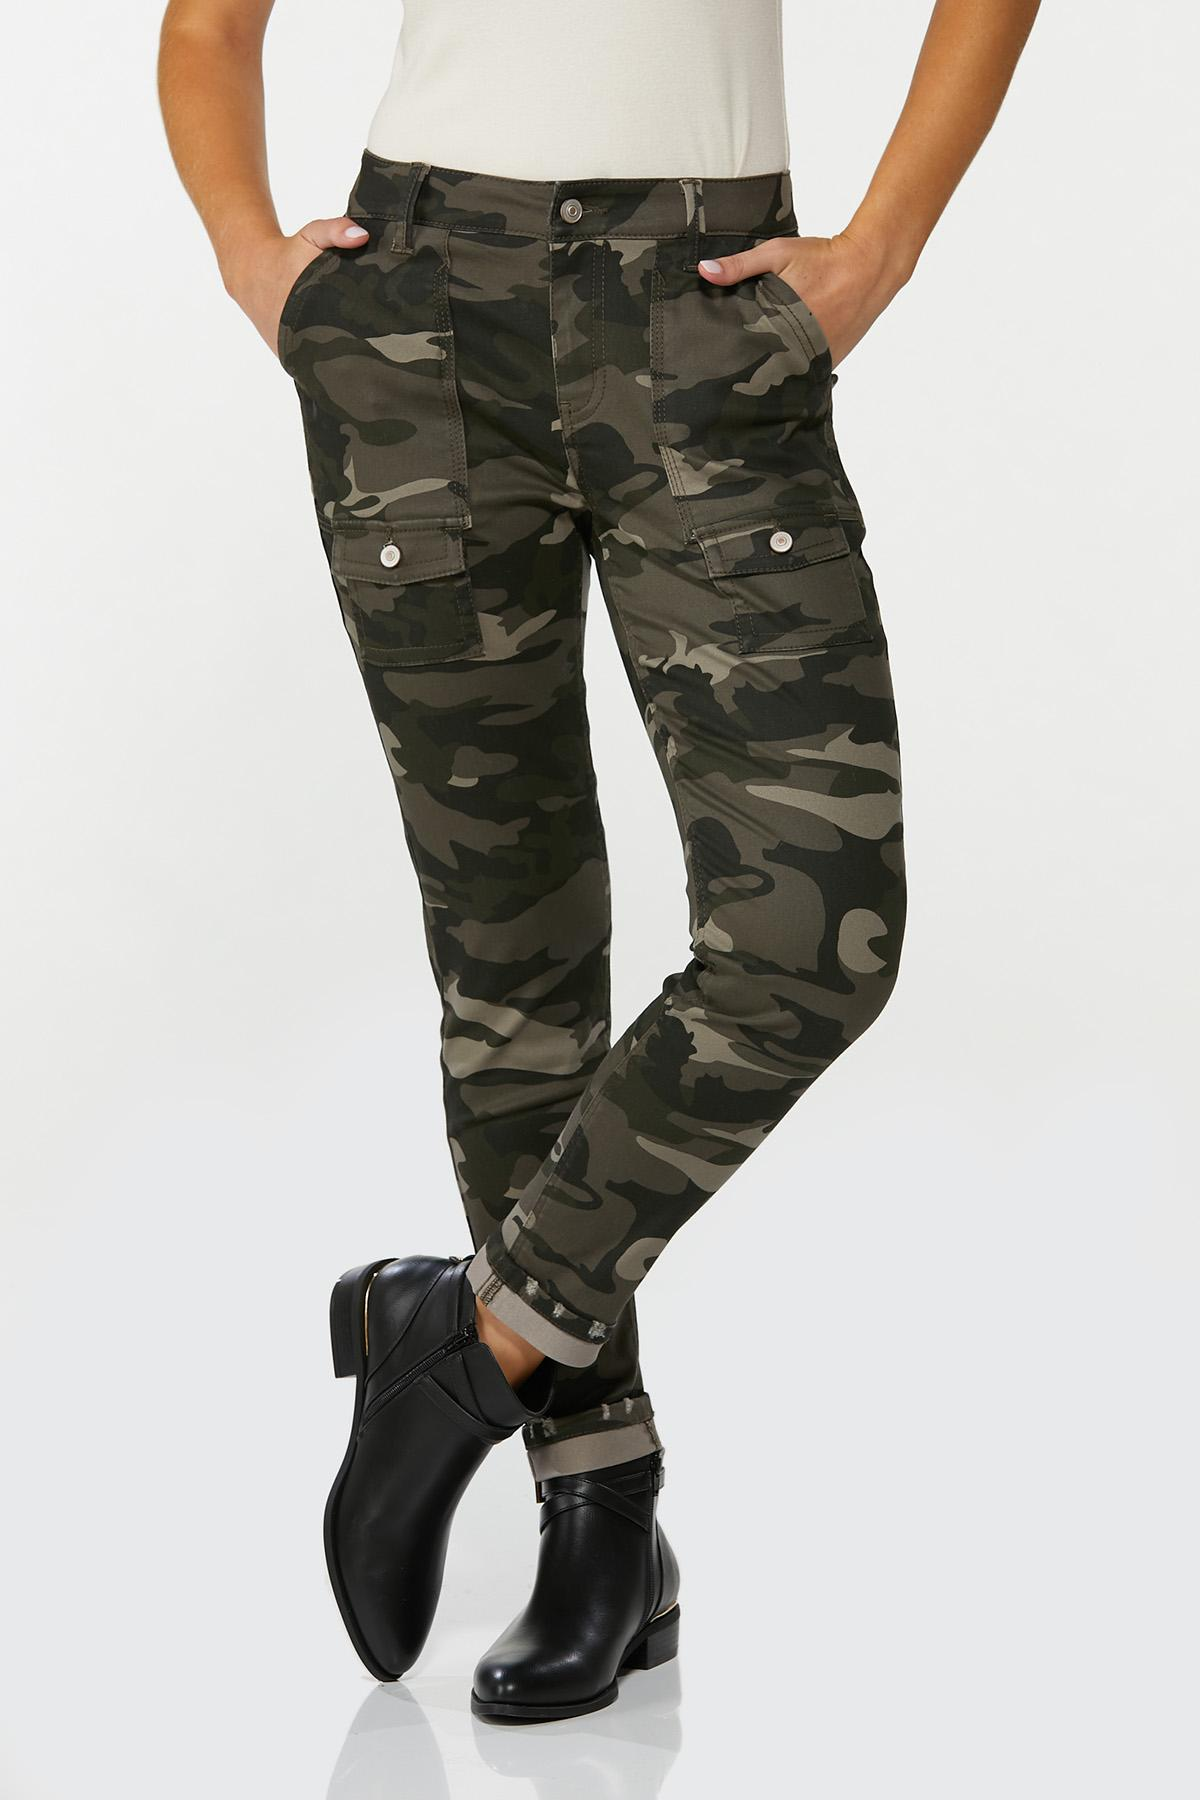 Camo Utility Pants